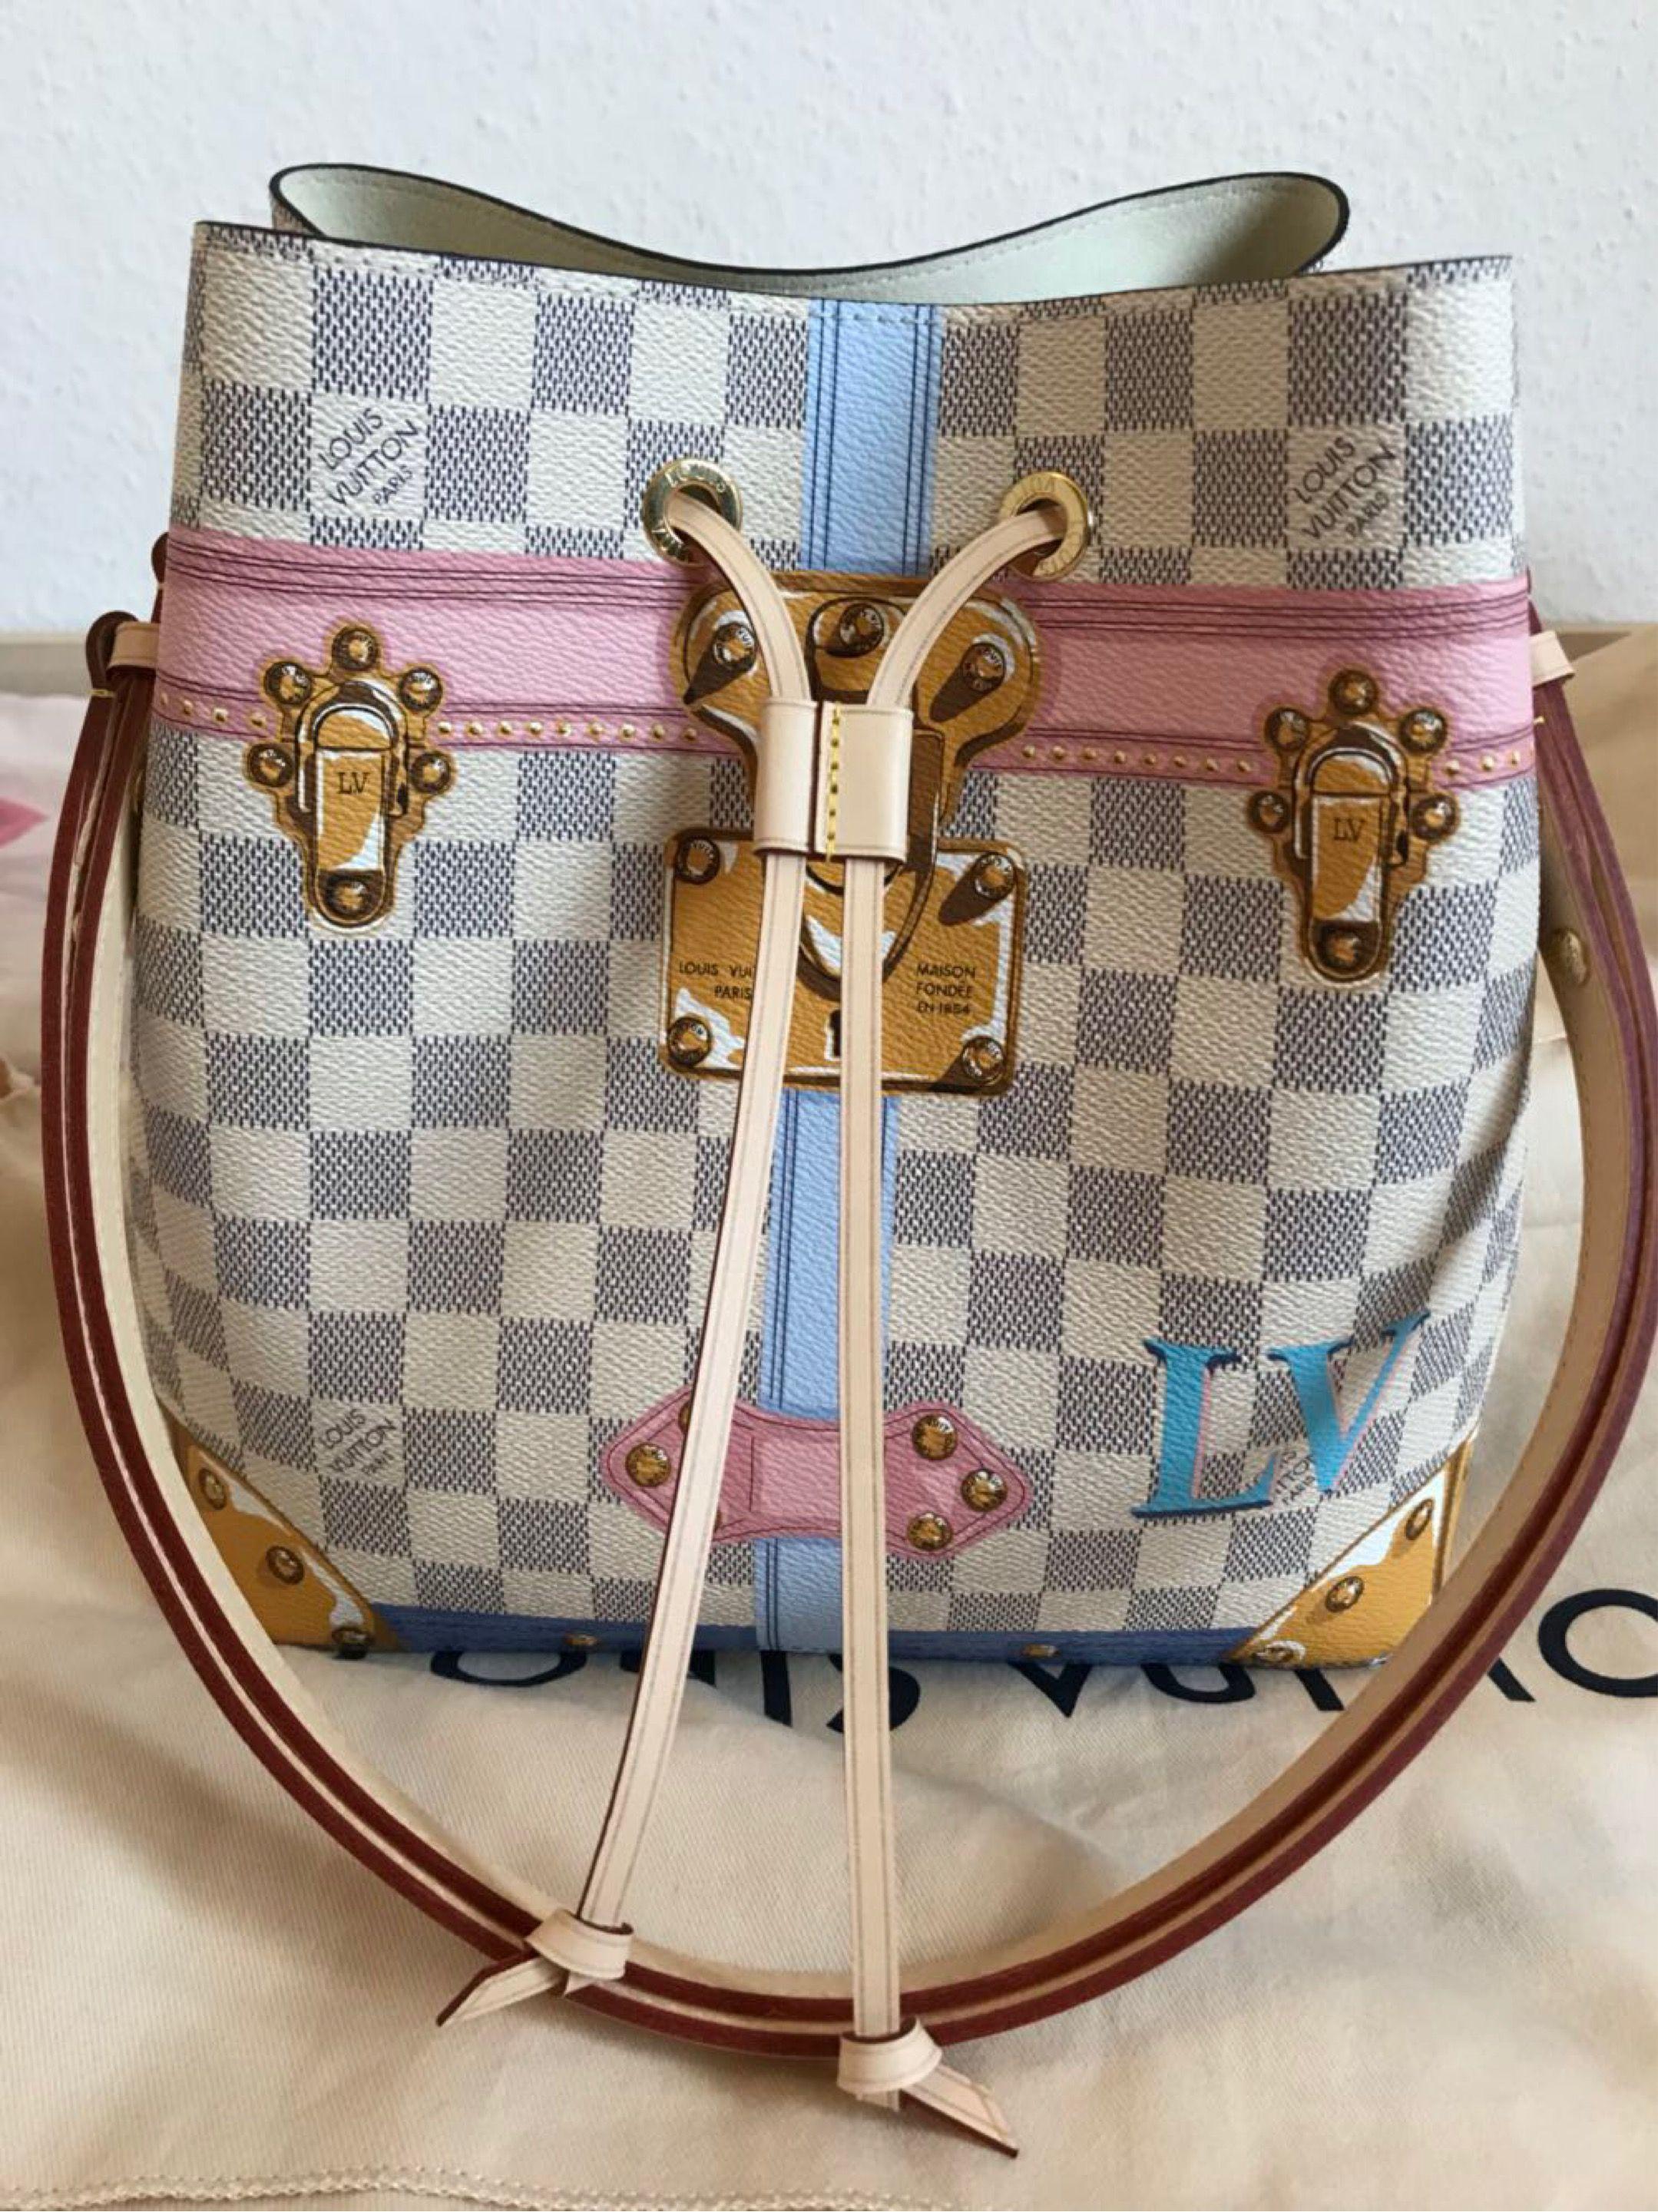 louis vuitton neonoe shoulder bag from luxury women 2018 sumer from  www.salepretty.com  neonoe  lv shoulder bag  lv bag f7e31ce90